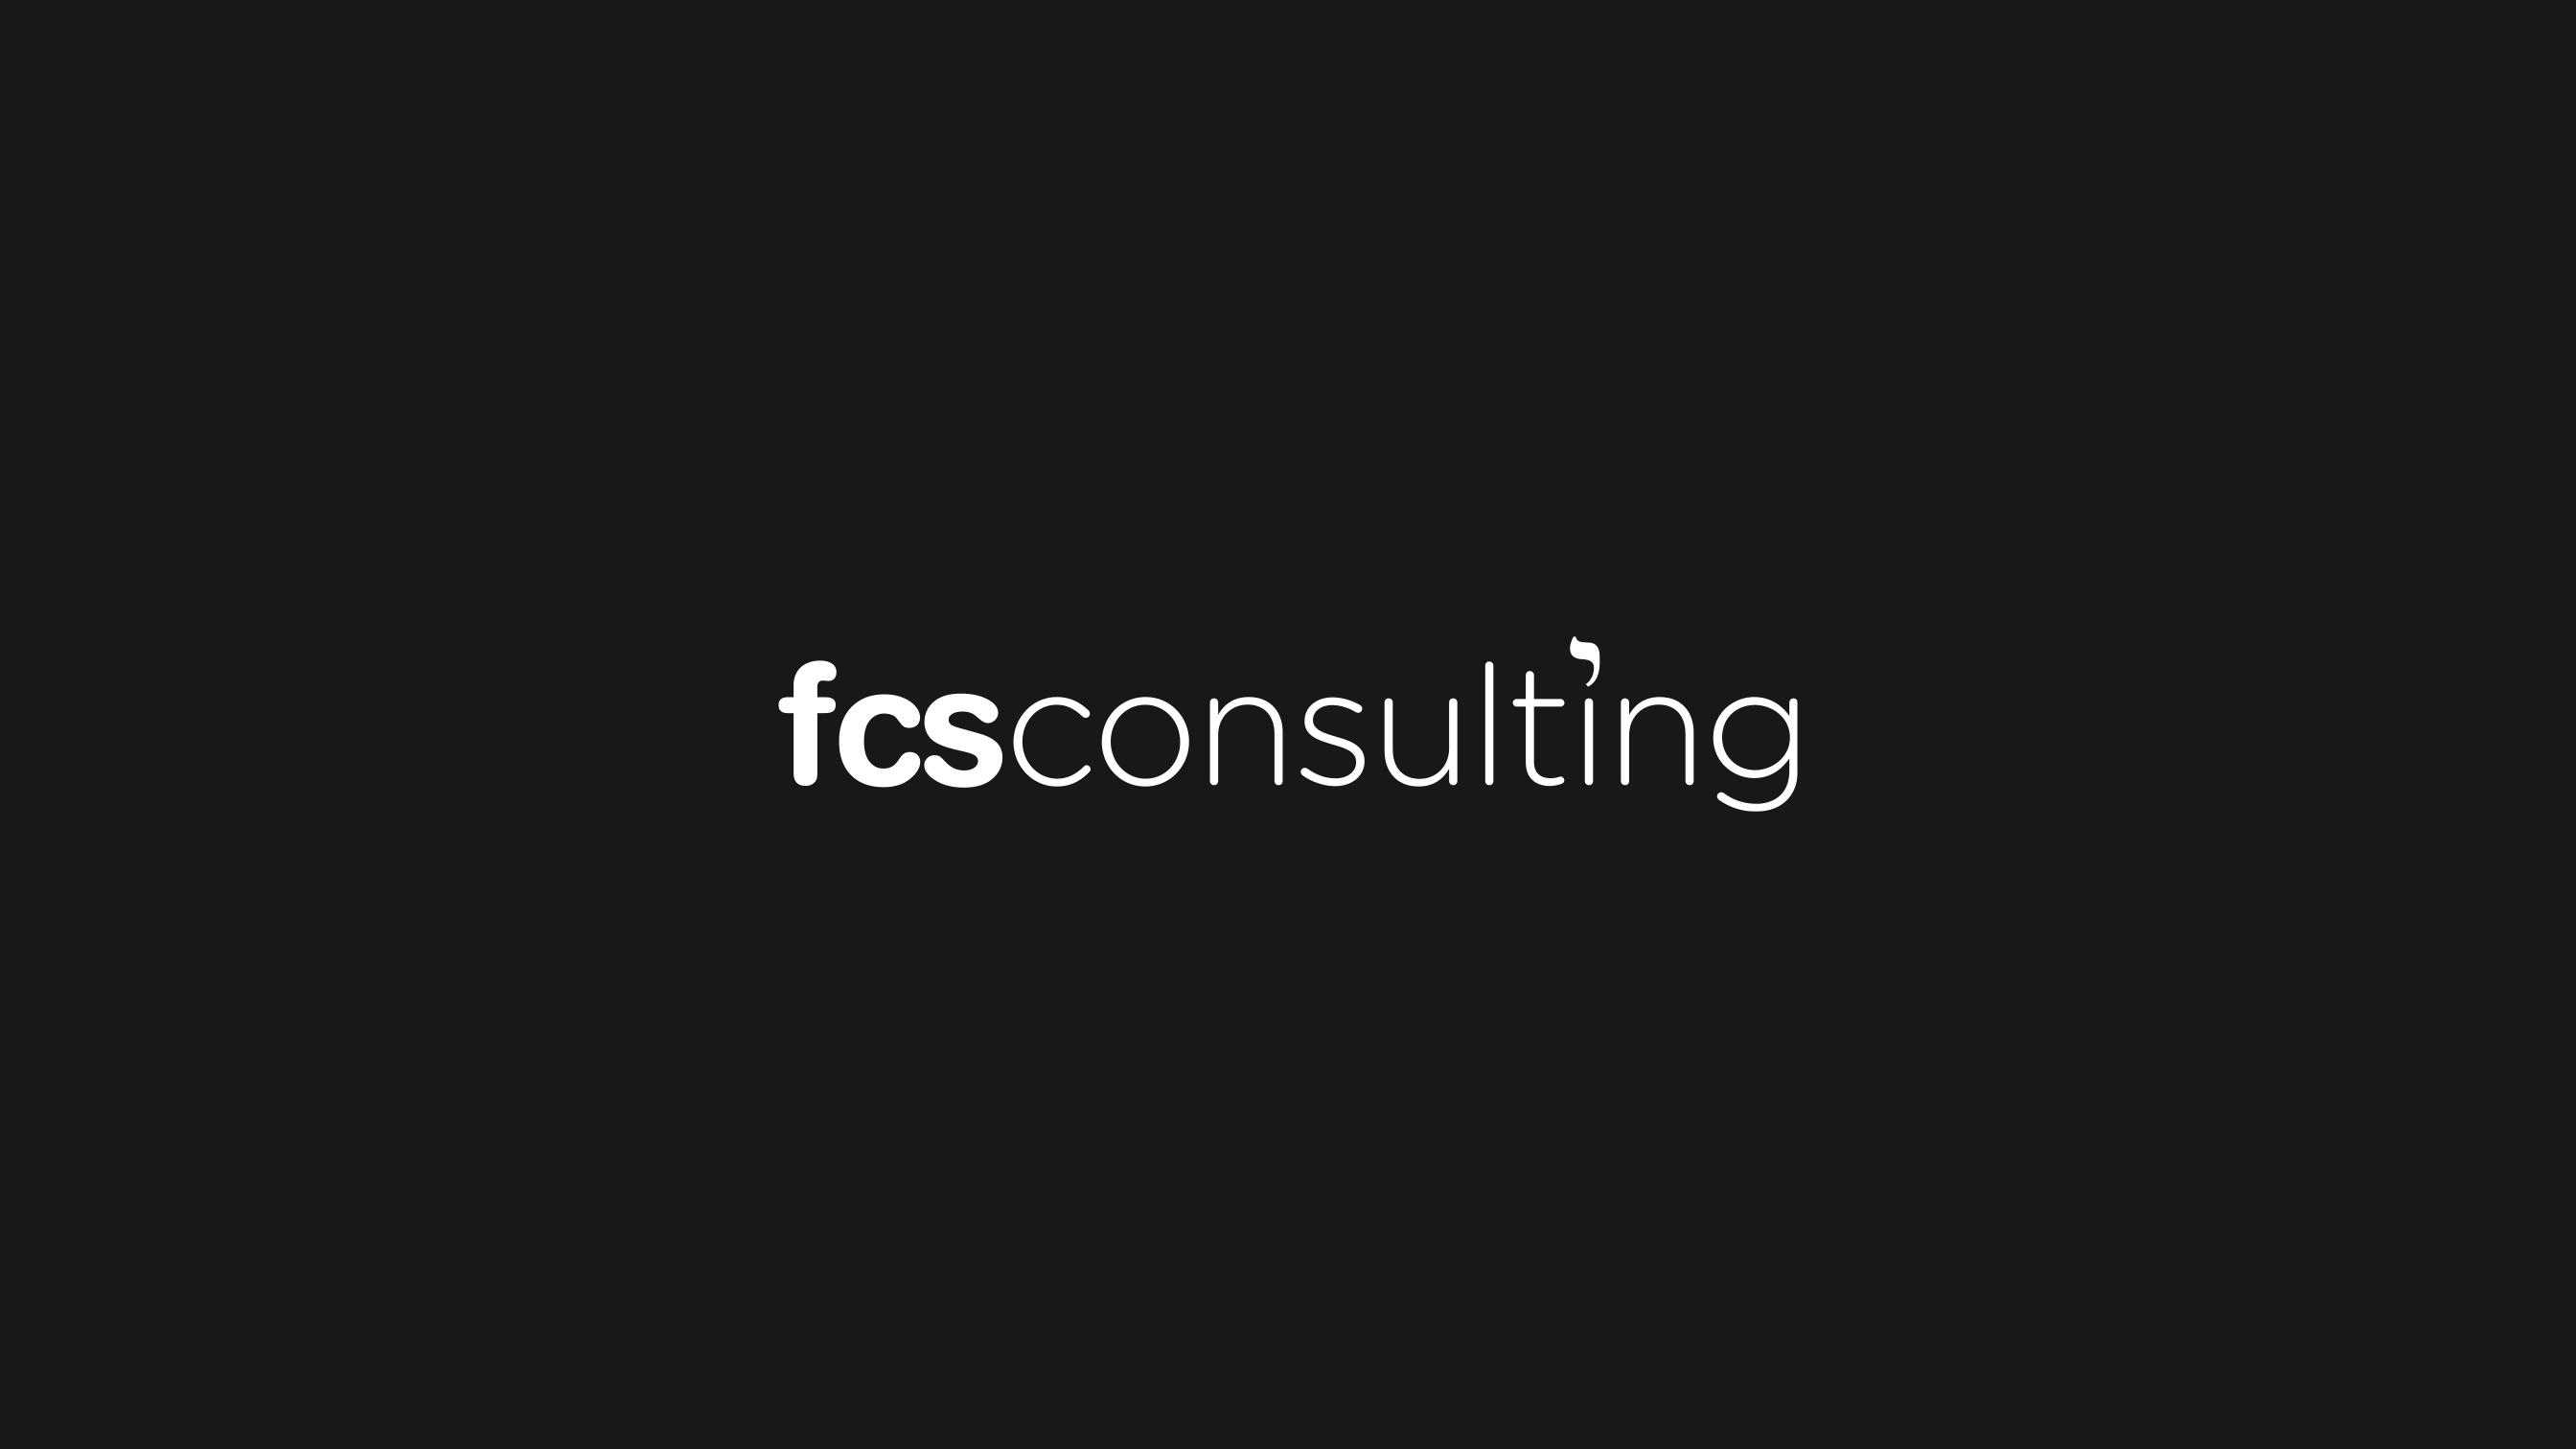 showcase-logotype-fcs